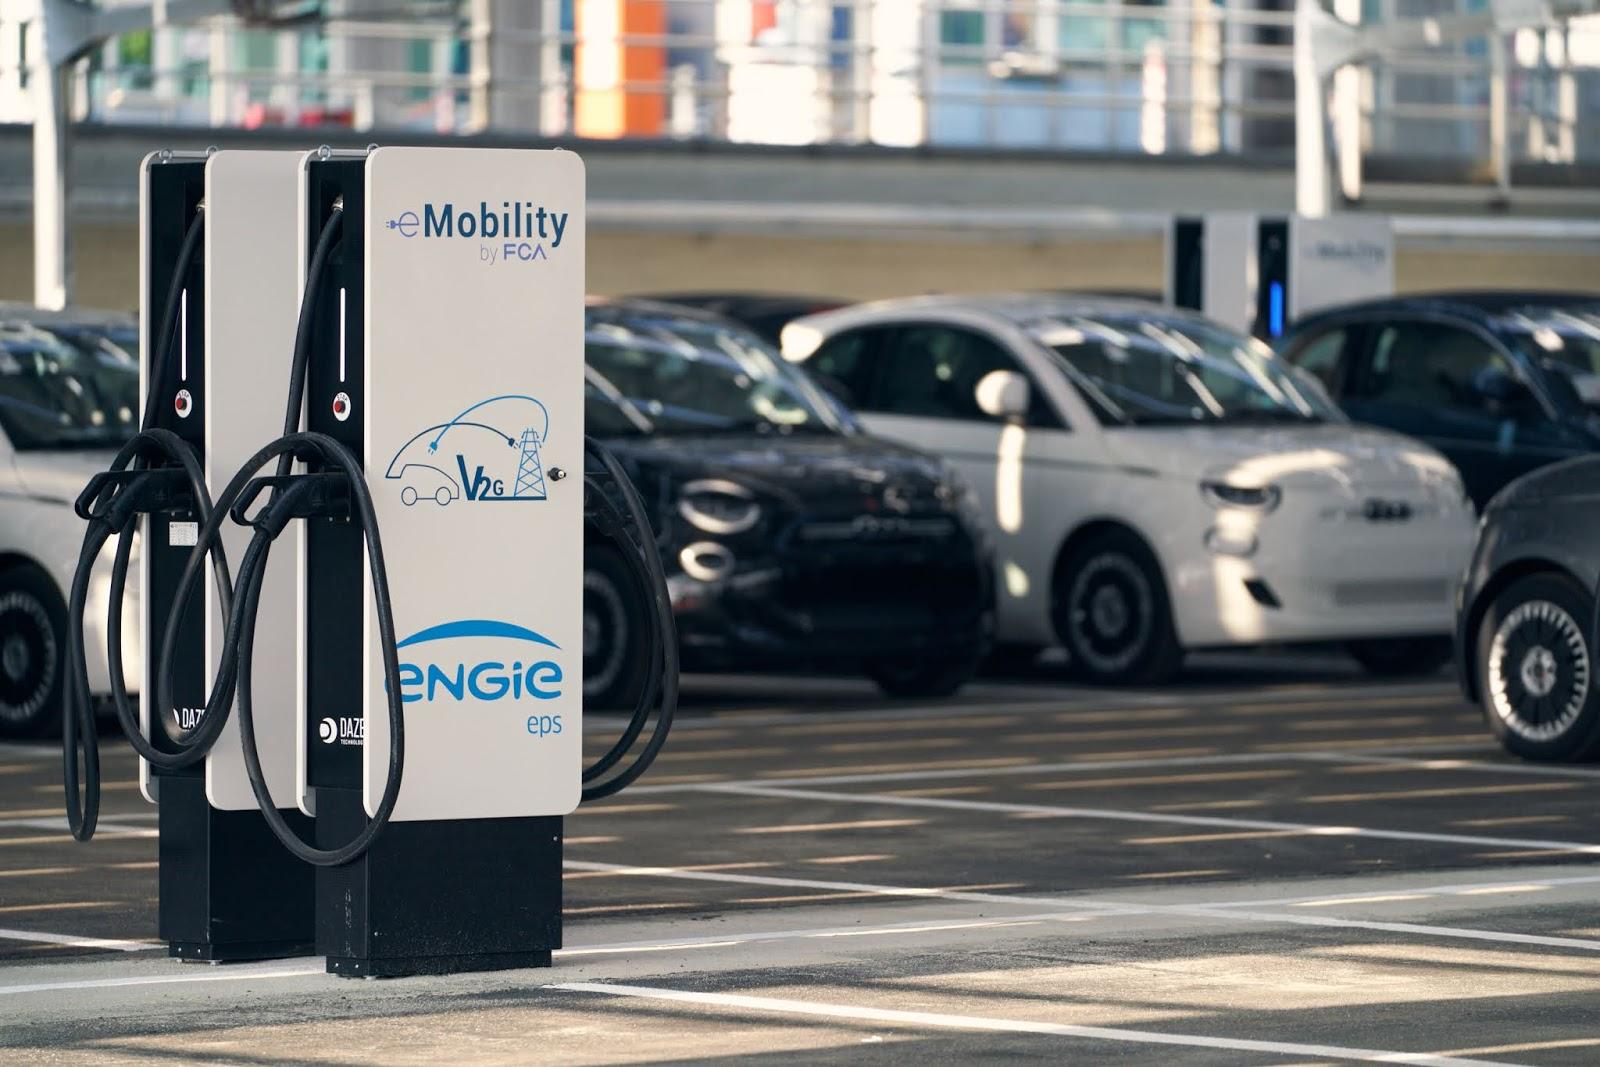 ALT7358 FCA & ENGIE EPS, ενώνουν τις δυνάμεις τους για τη βιώσιμη αυτοκίνηση μέσω των δικτύων V2G, χρησιμοποιώντας μεταχειρισμένες μπαταρίες